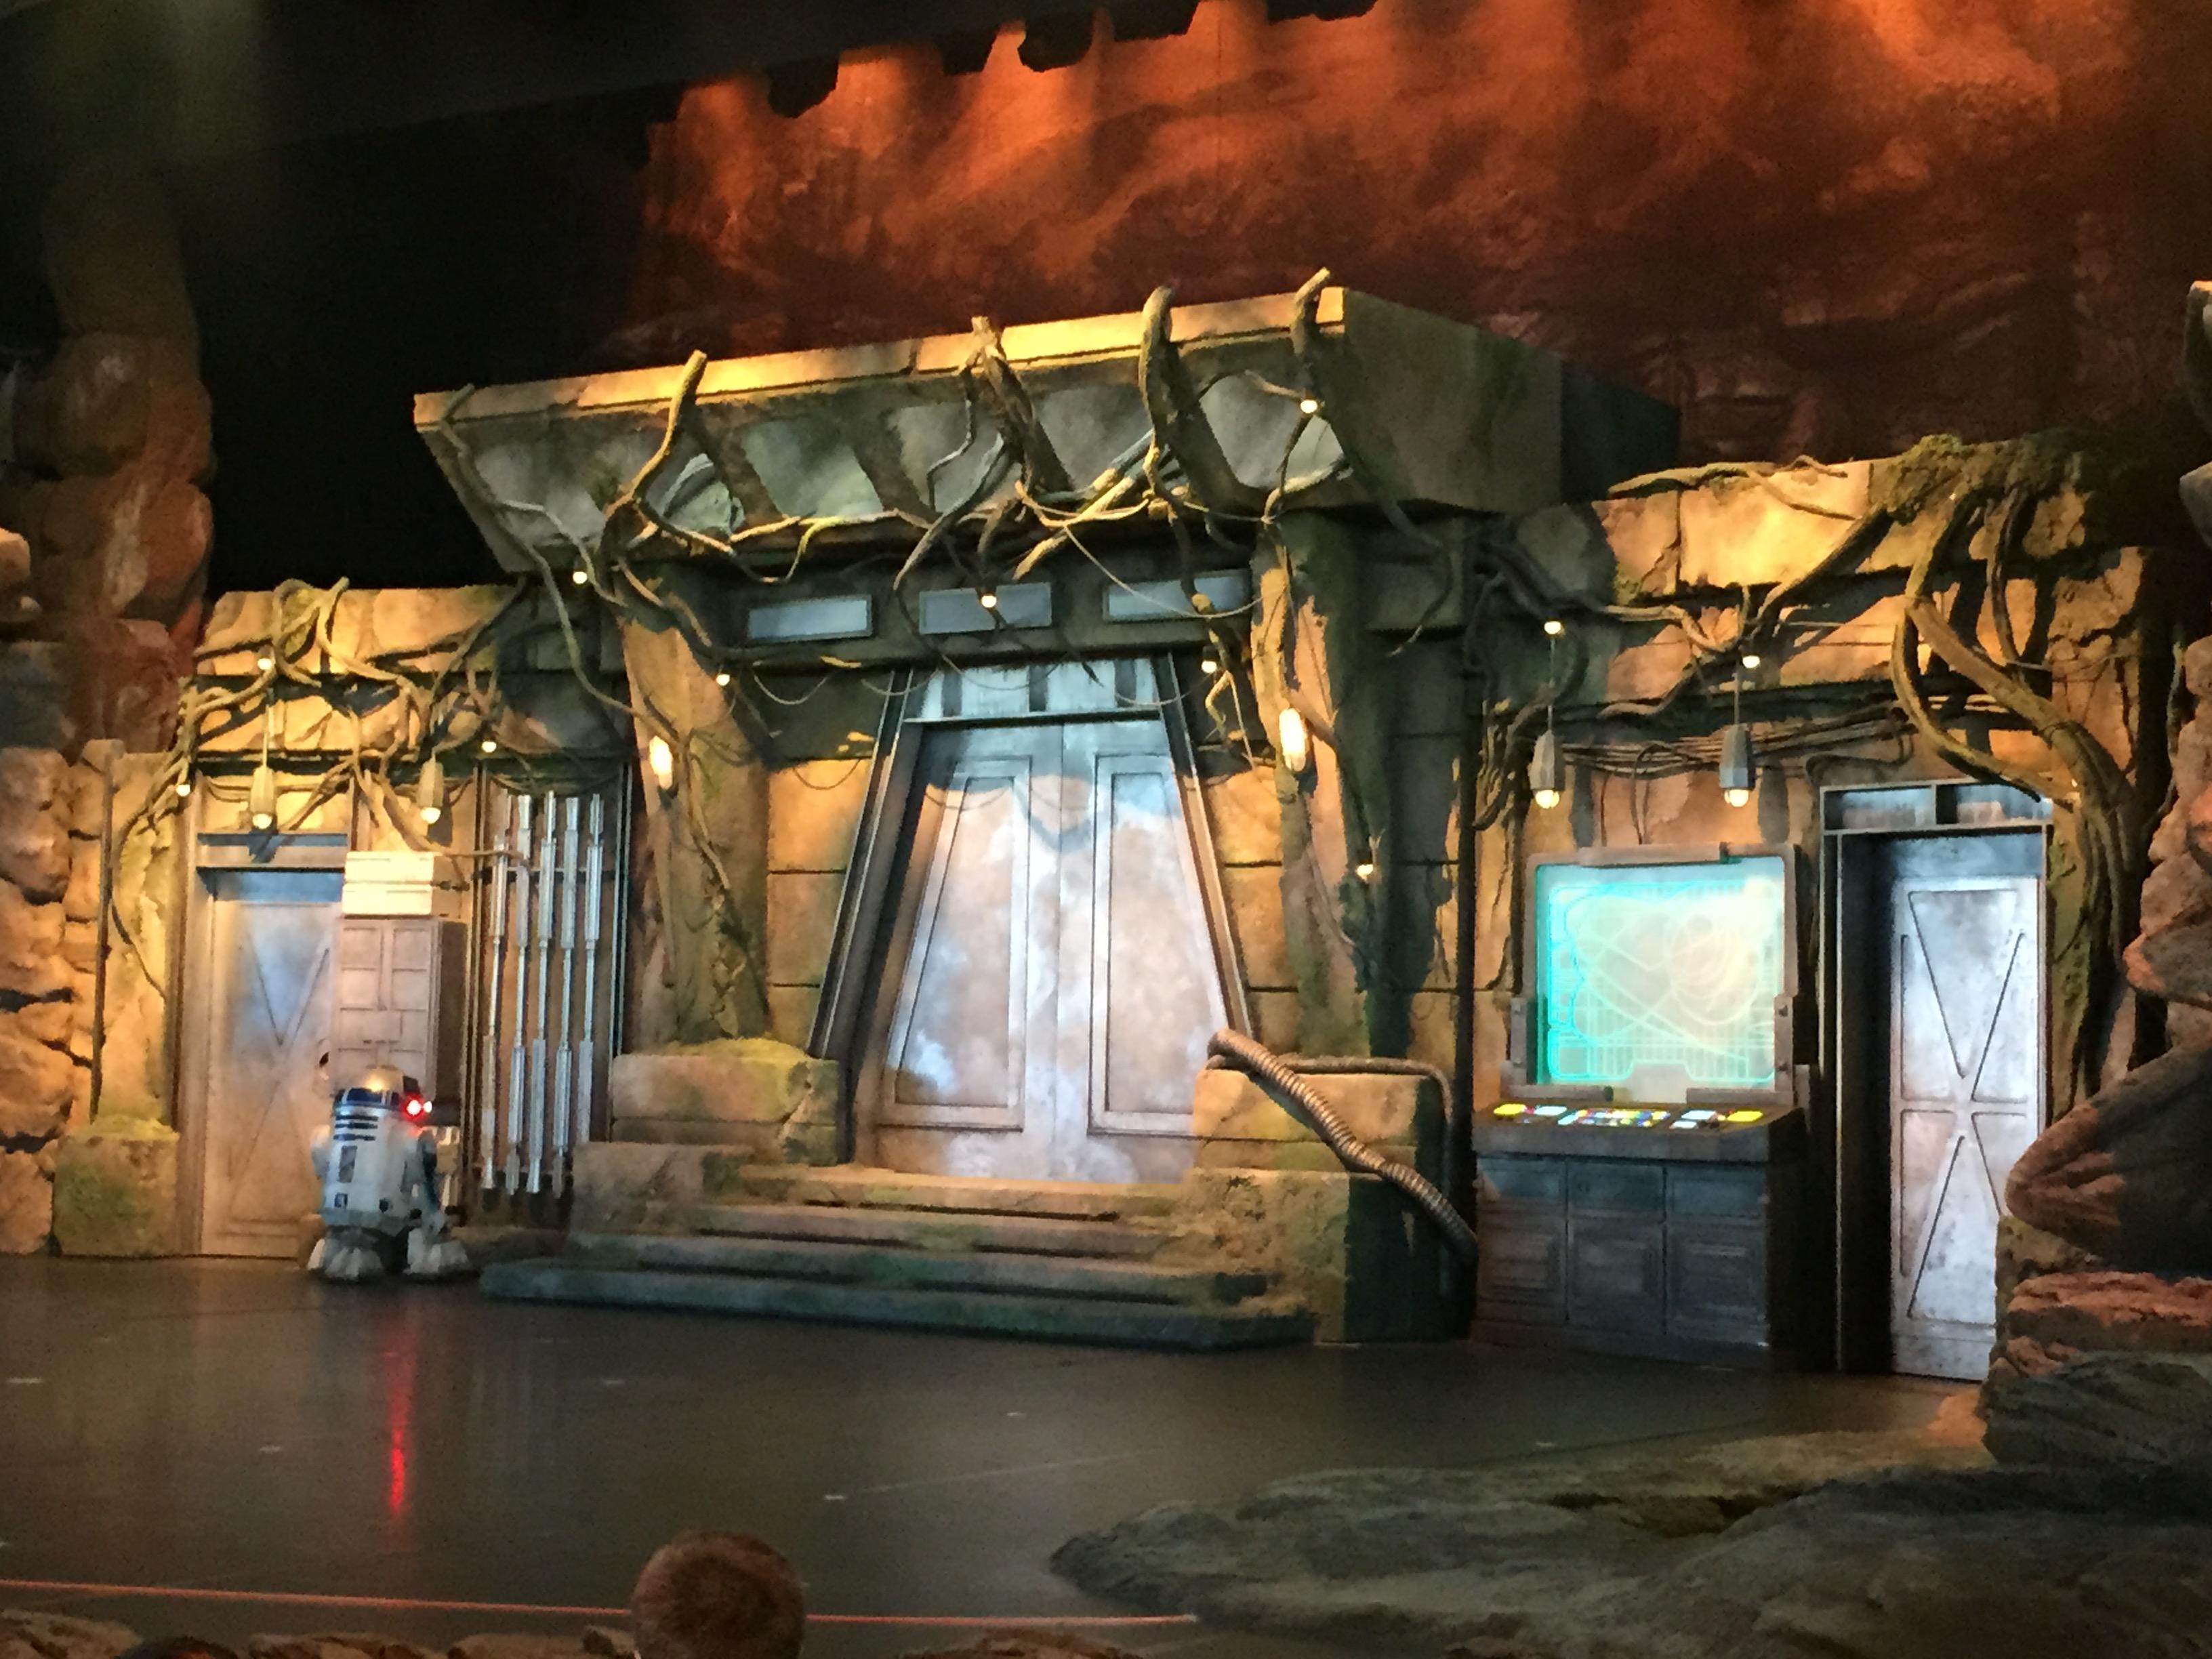 Roblox Disneylands Fantasmic Youtube Jedi Training Trials Of The Temple Disney Wiki Fandom